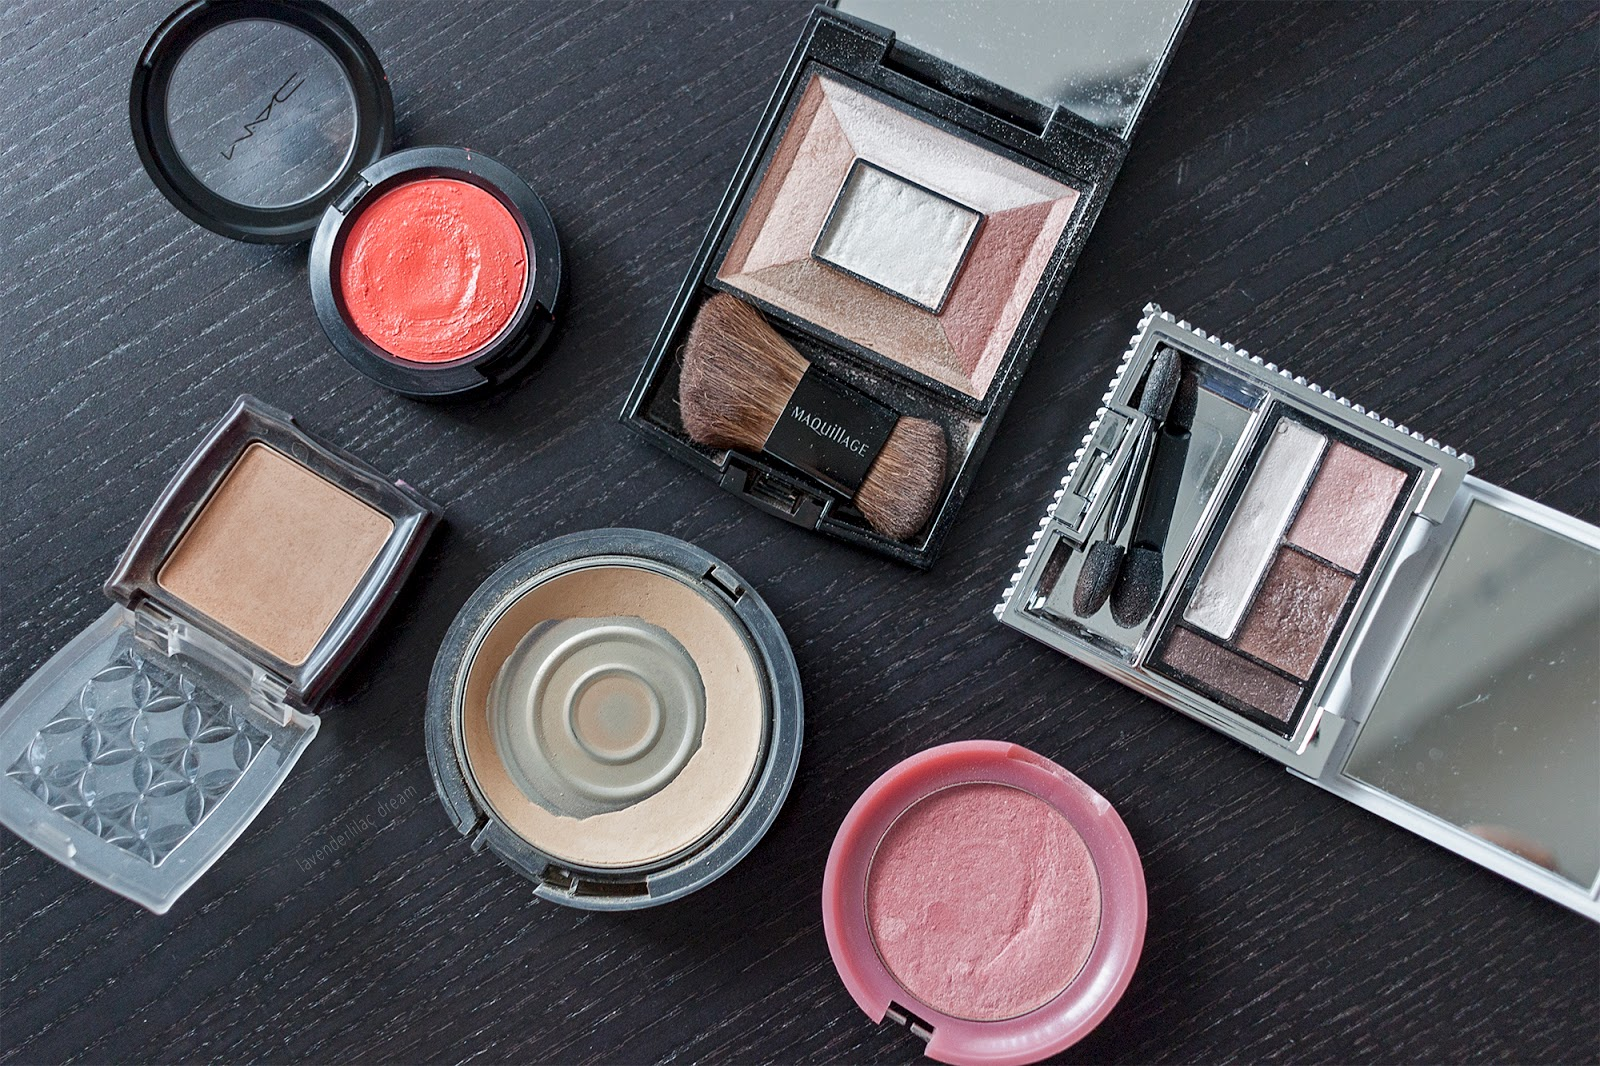 Asian makeup, Korean makeup, Japanese makeup, Etude House blush, Etude House bronzer, Maquillage Face Creator, Esprique Precious eye palette, MAC cosmetics cream colour blush